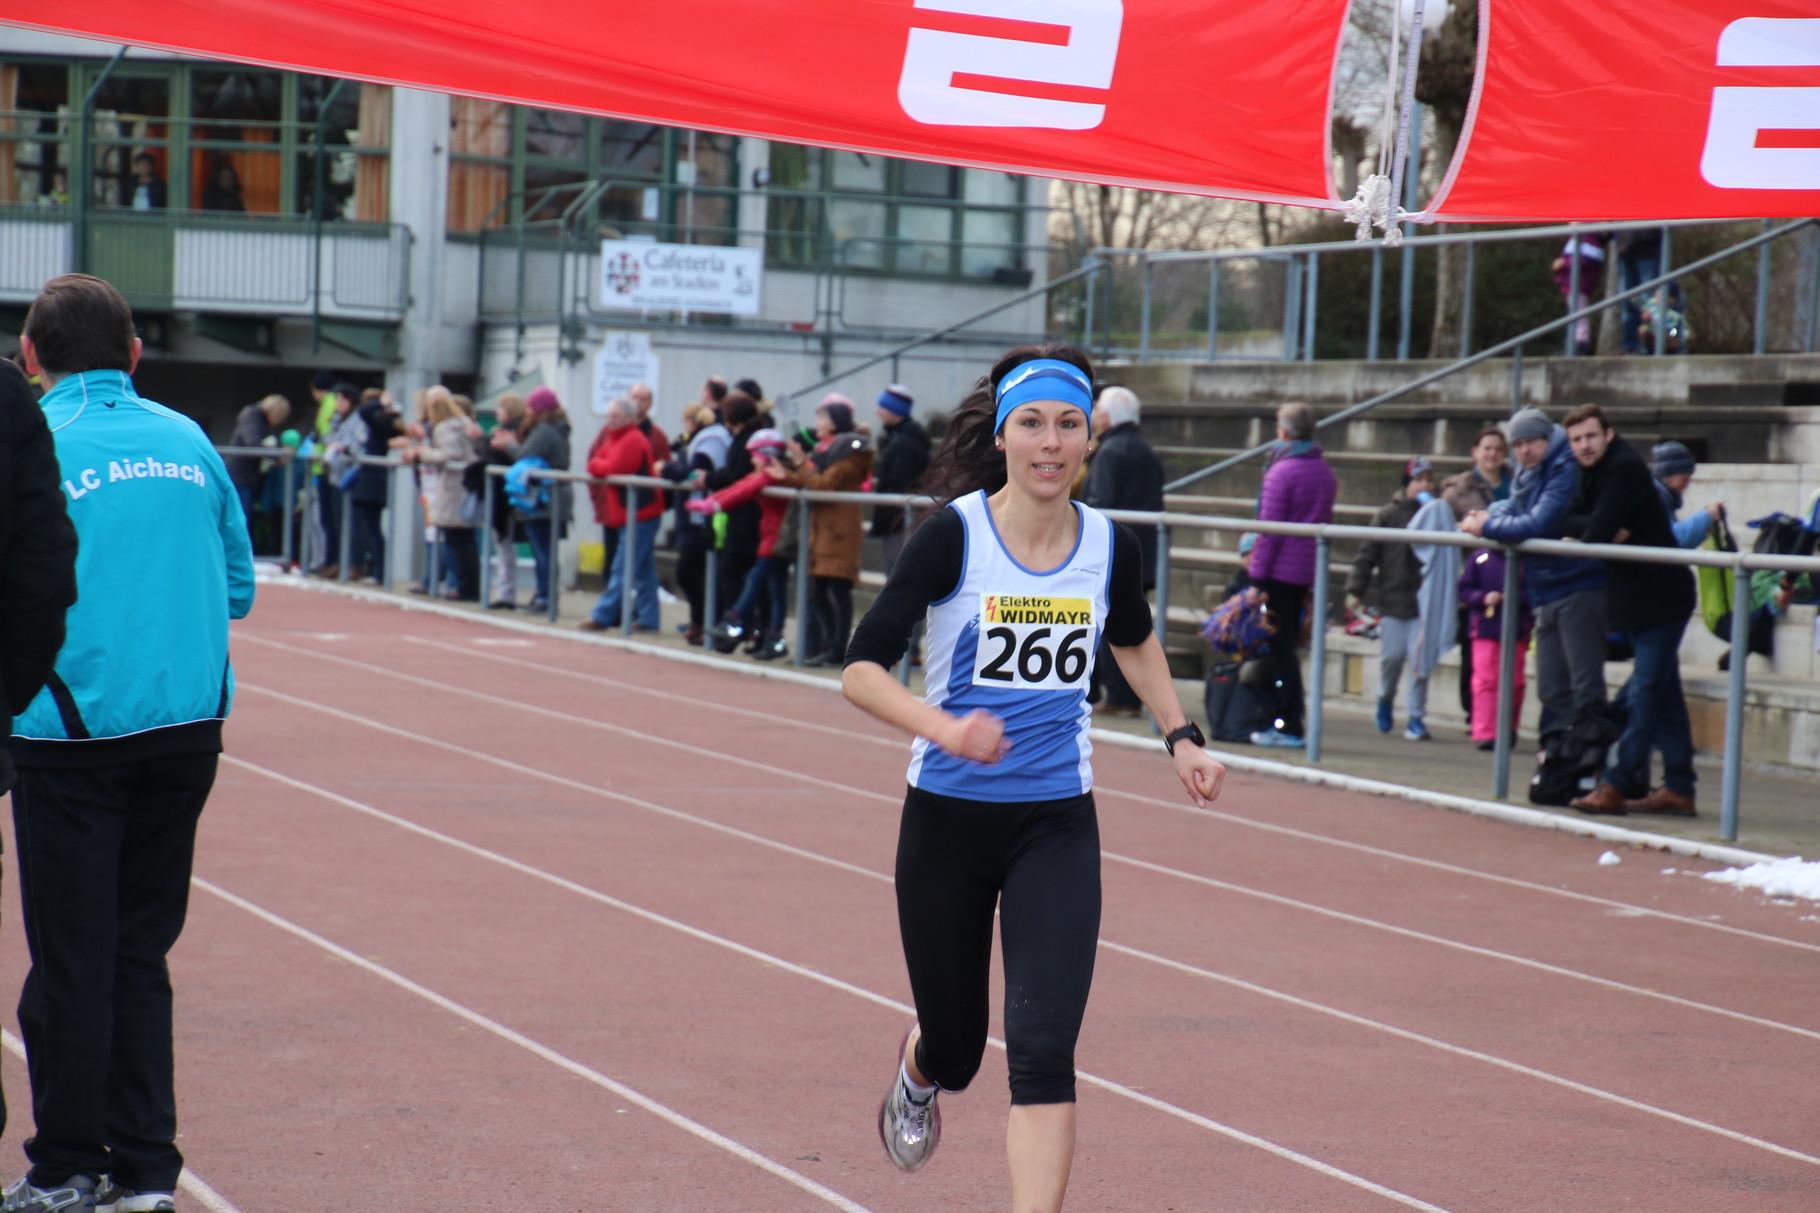 2.Platz Frauen: Hoppmair Elisabeth PTSV Rosenheim